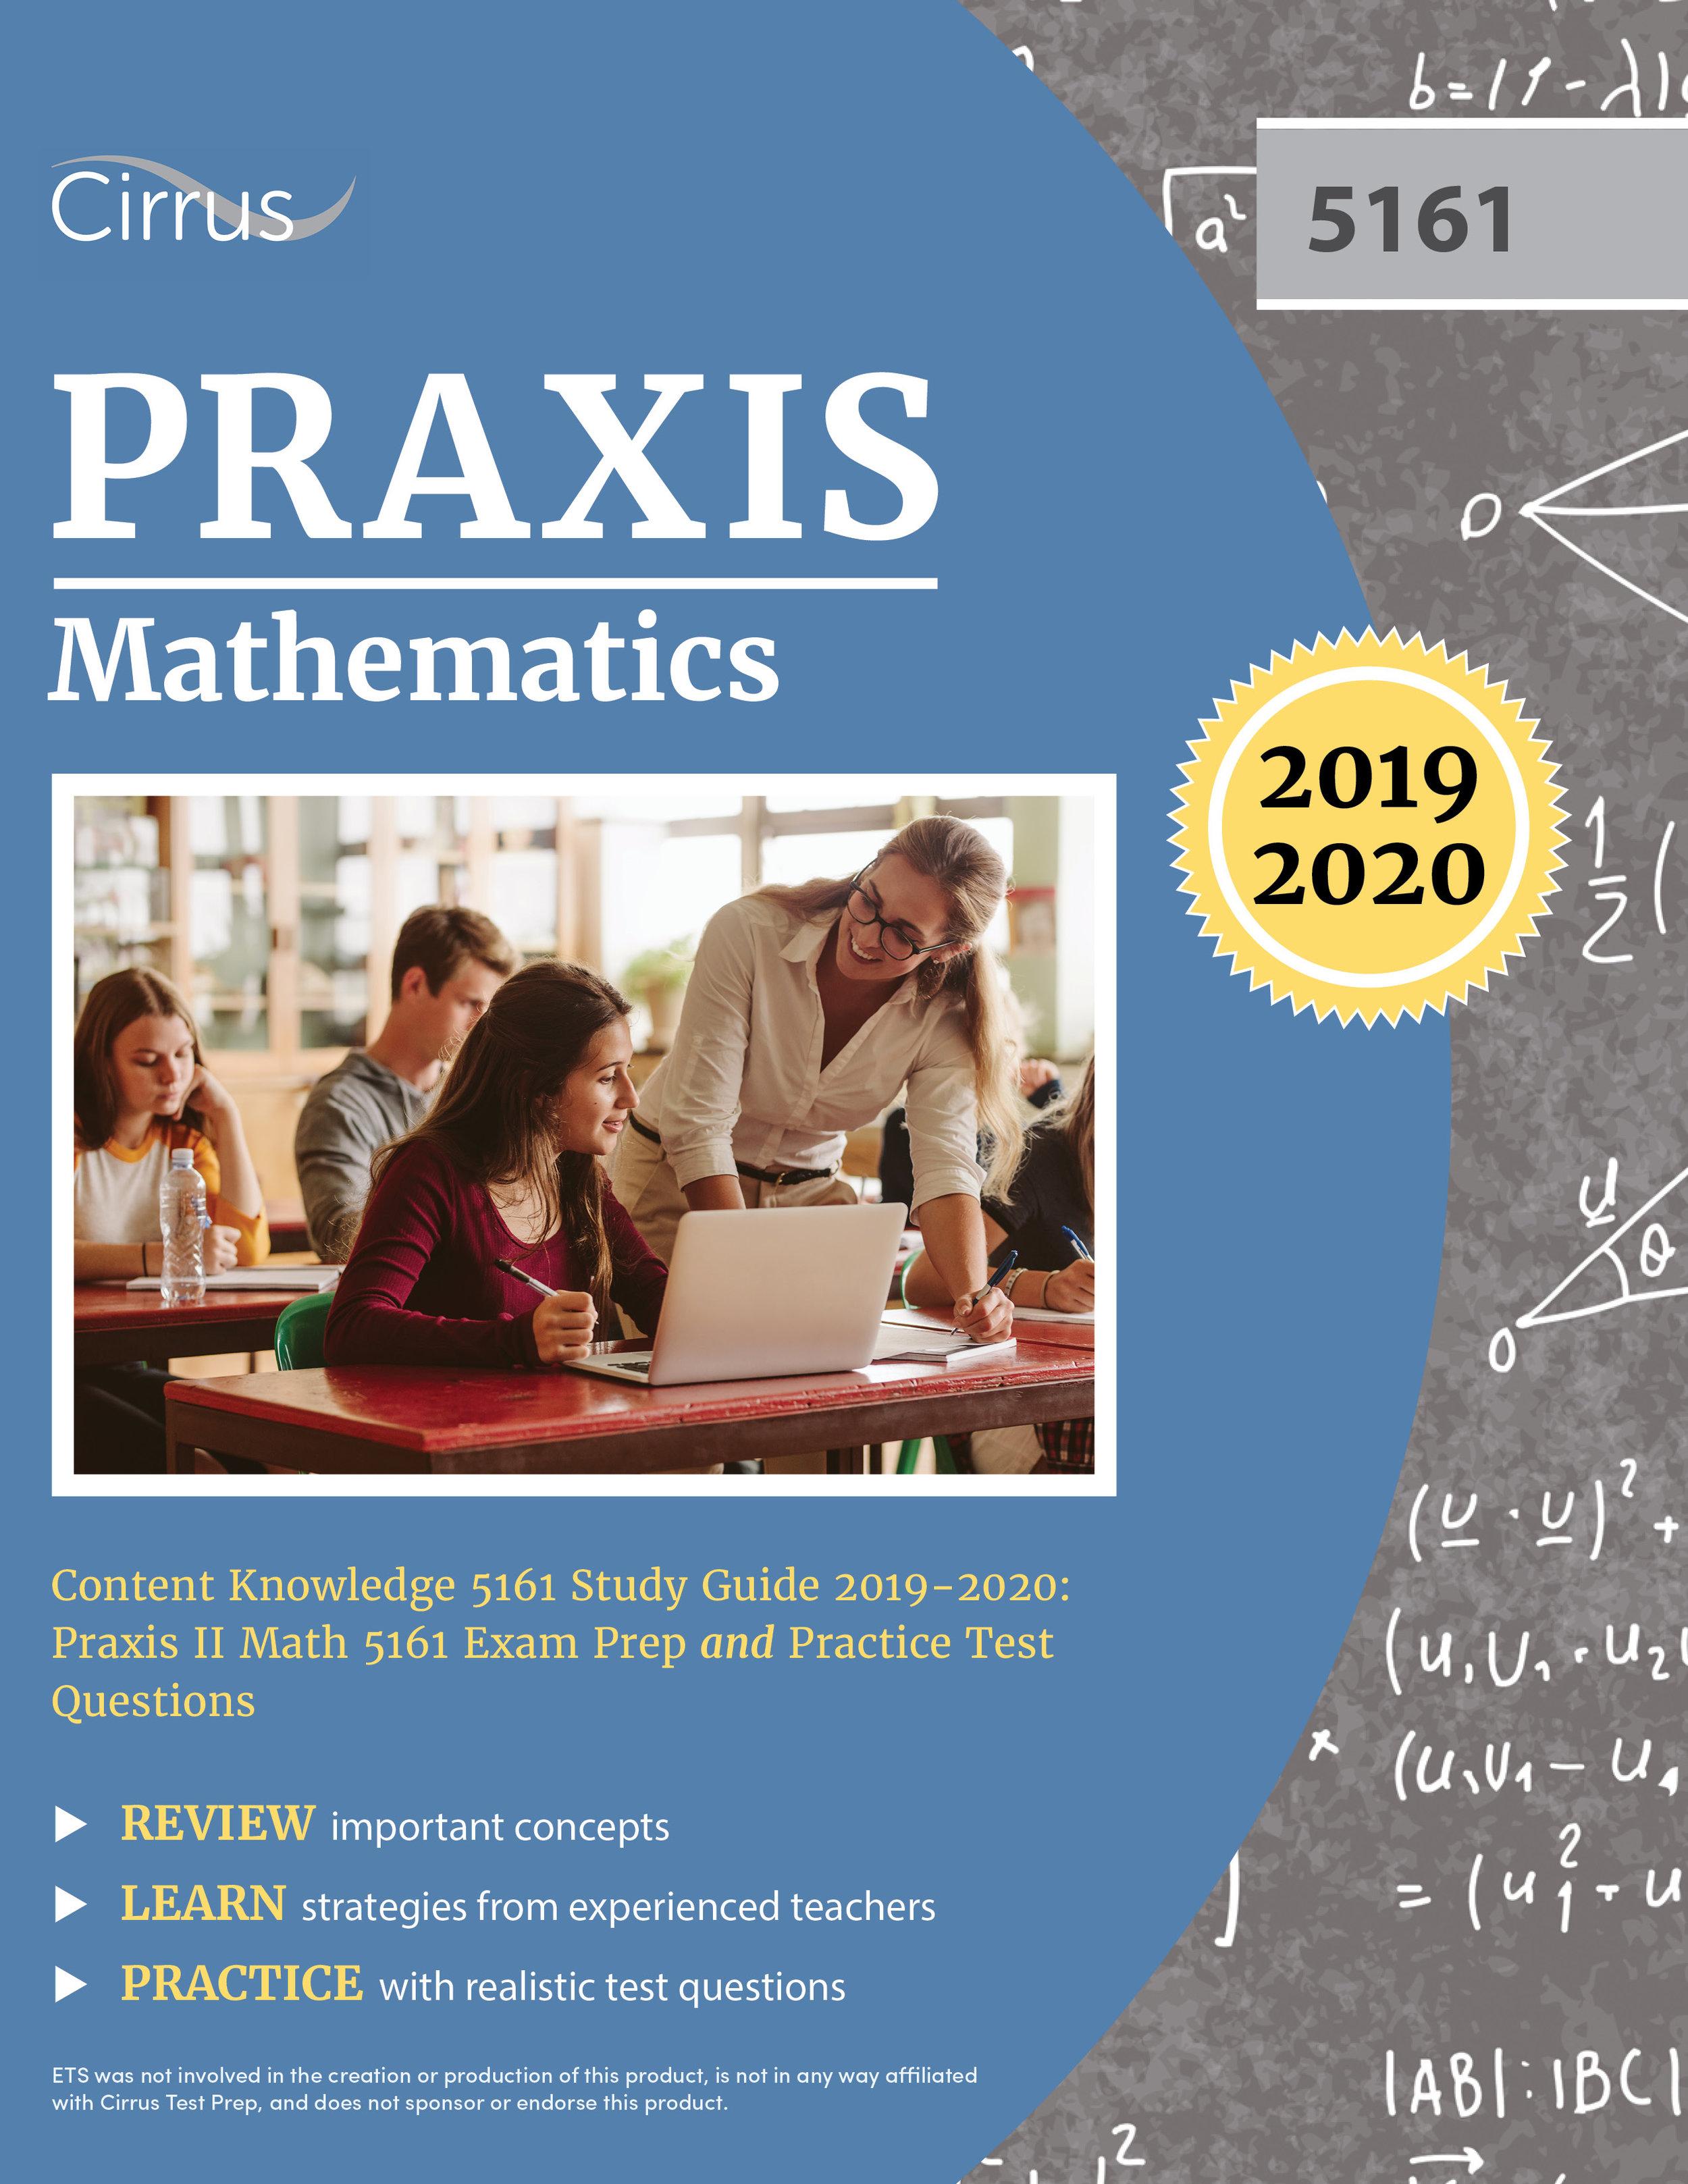 Praxis_math_cover_website.jpg